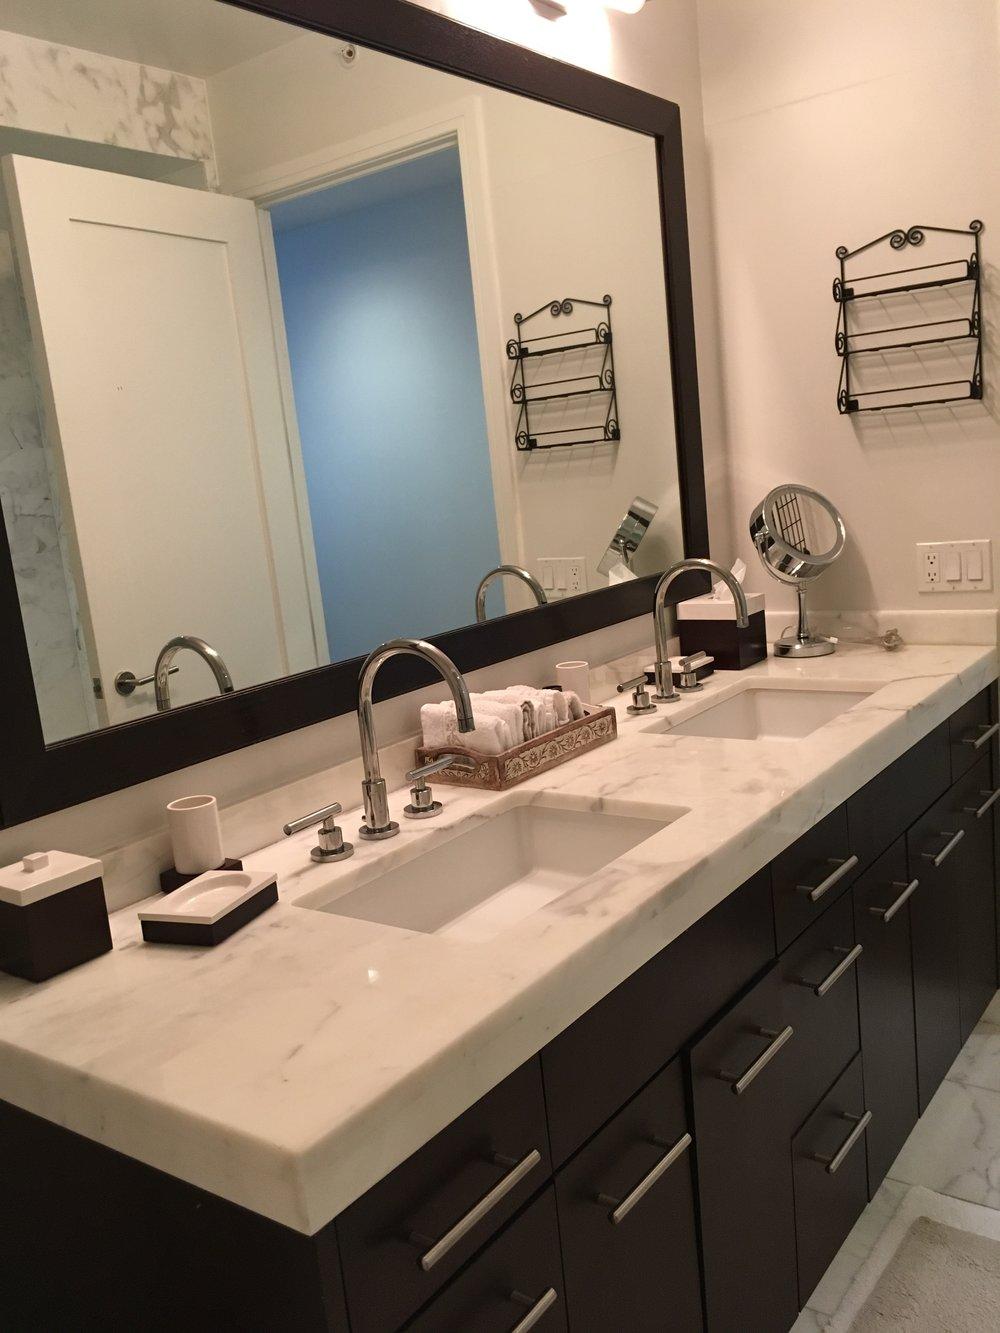 Philadelphia Luxury Home Condo-the ritz carlton residences 15A bryant wilde realty10.JPG